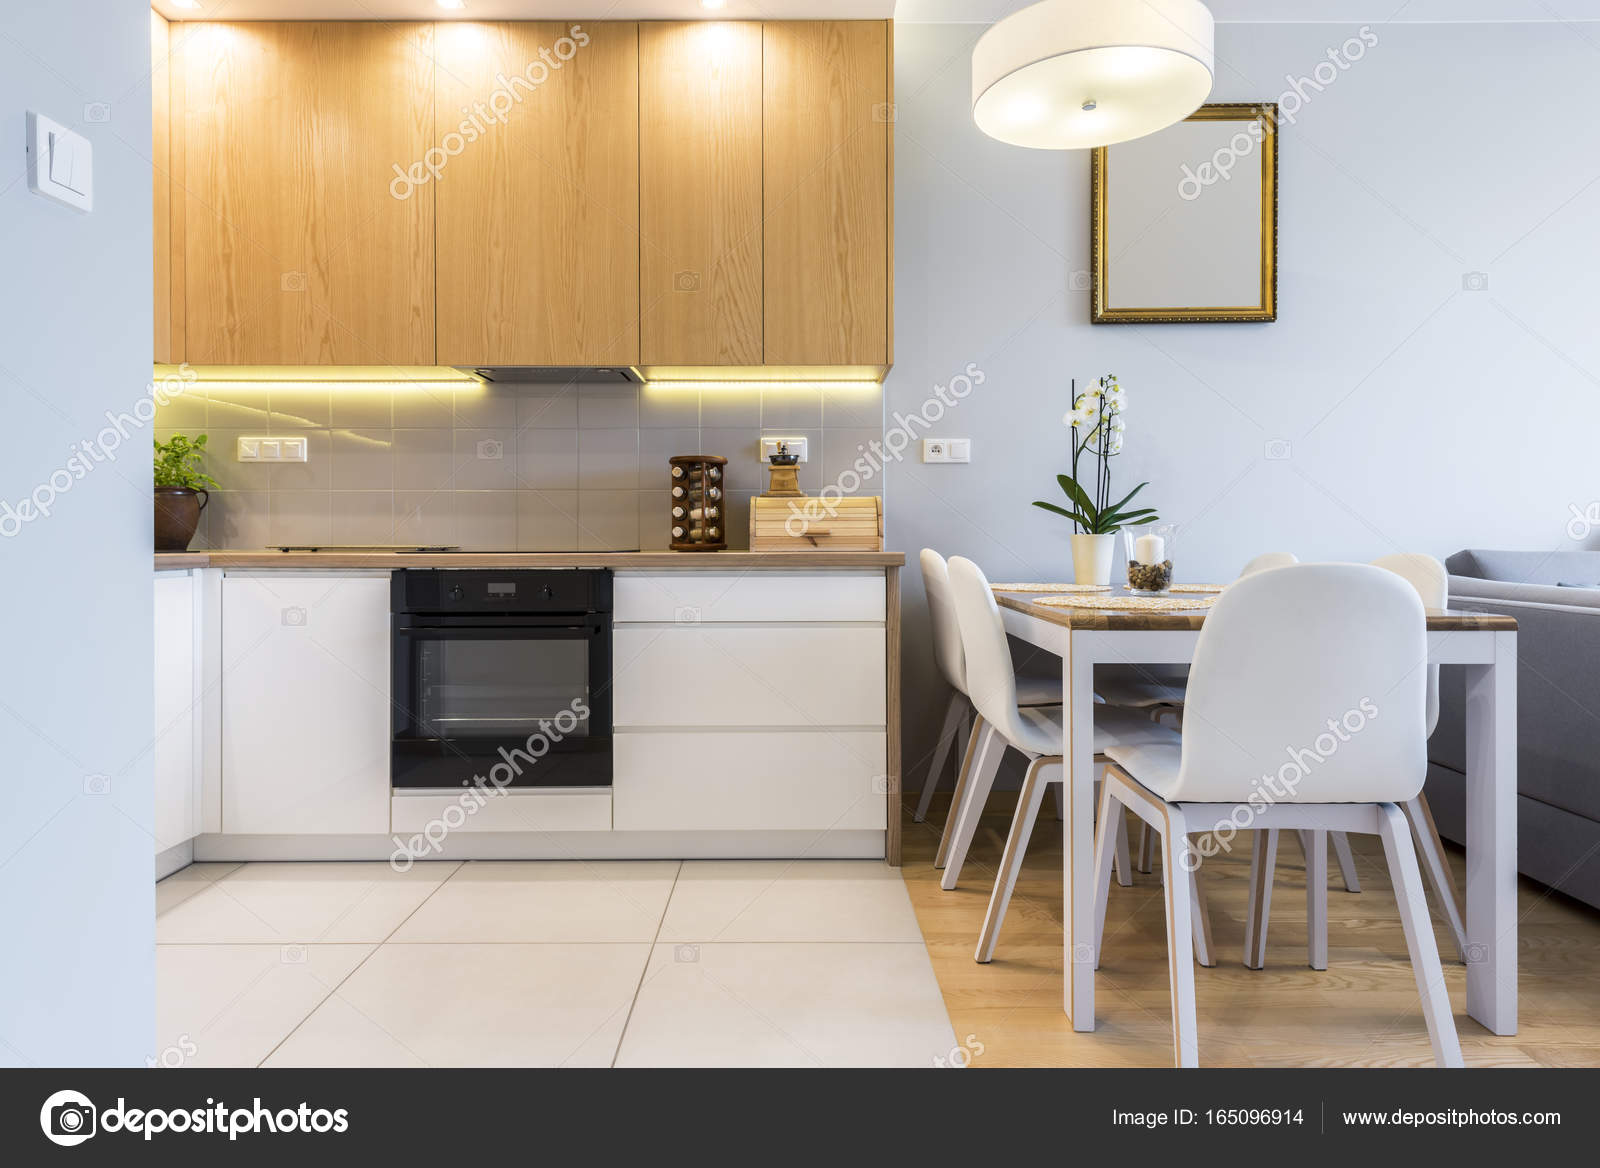 cocina de moderno diseño interior — Foto de stock © jacek_kadaj ...